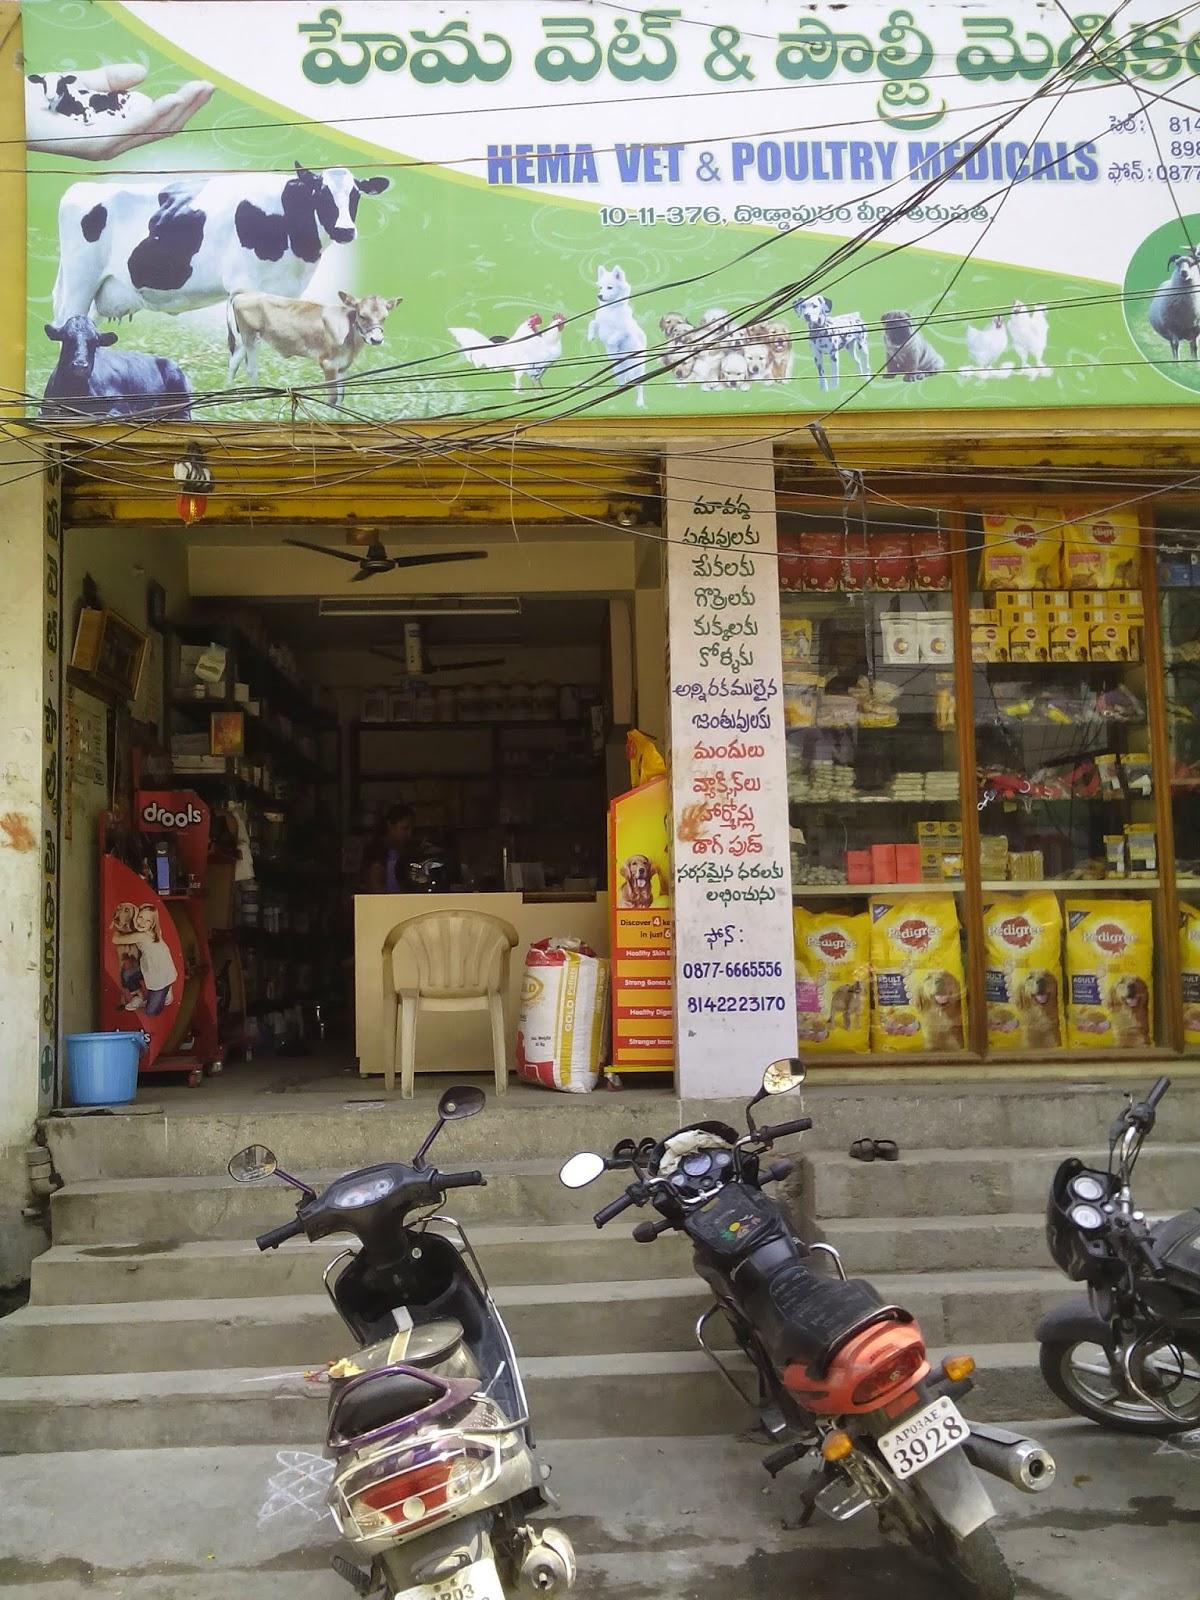 HEMA VET & POULTRY MEDICALS Tirupati